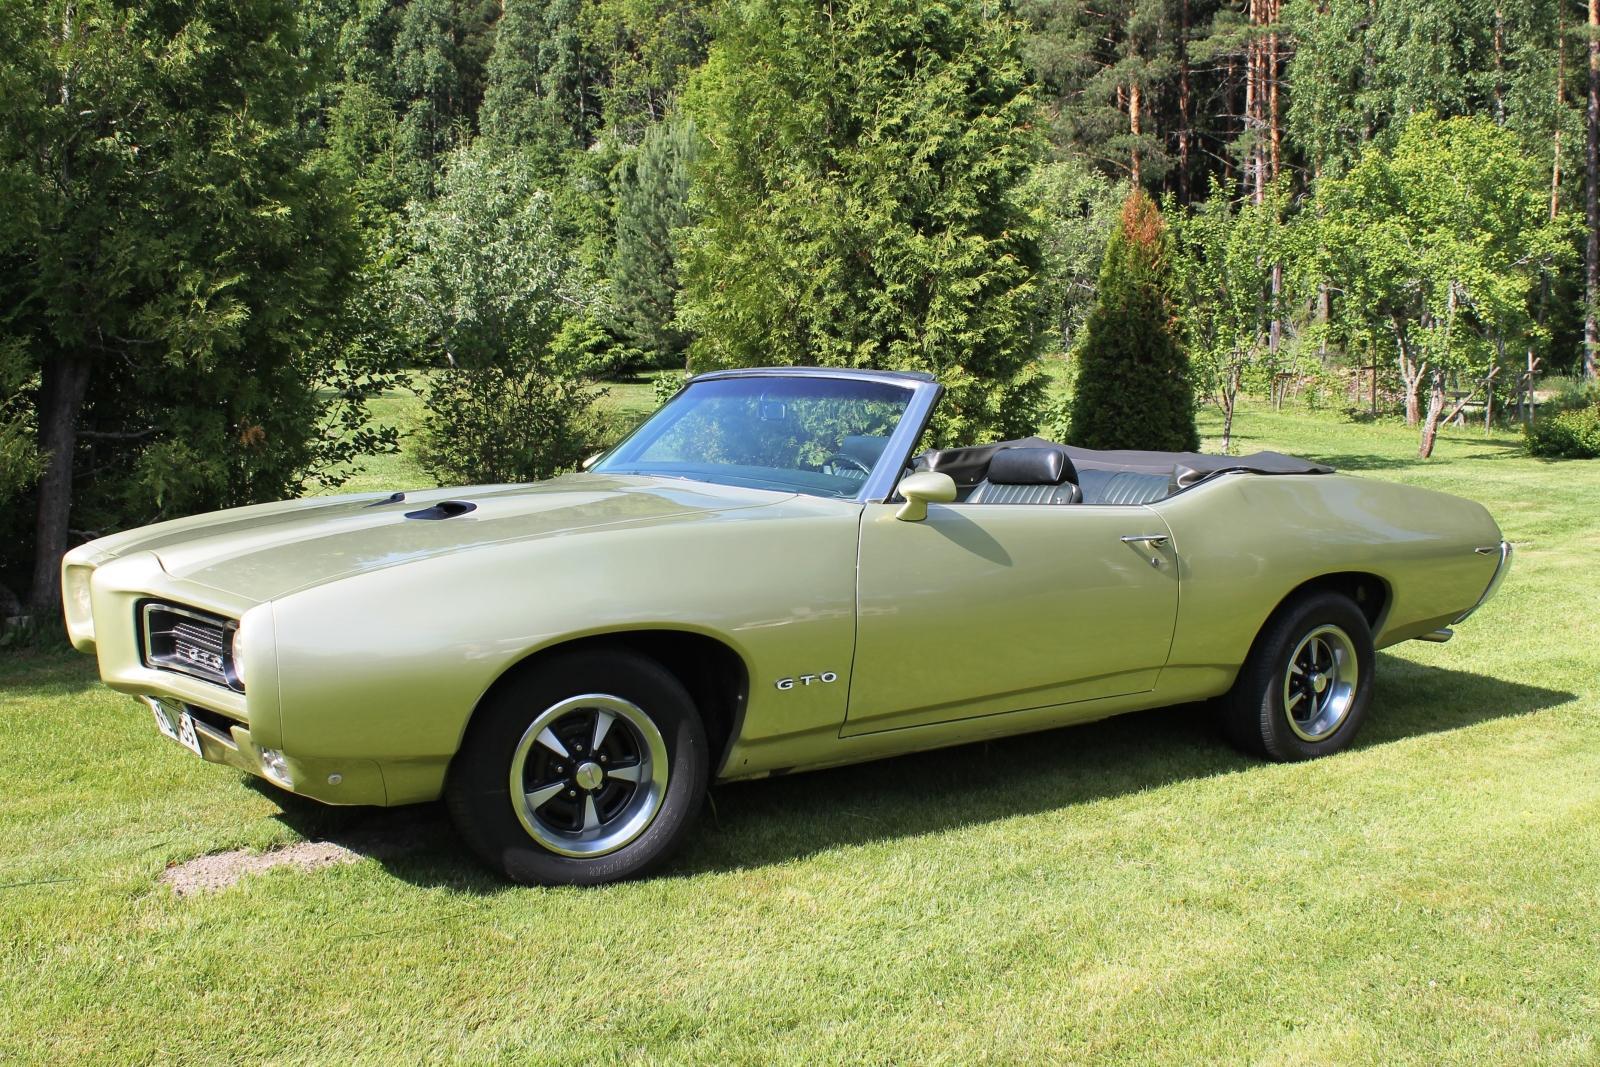 1969 Pontiac GTO<br>400cid+TH400